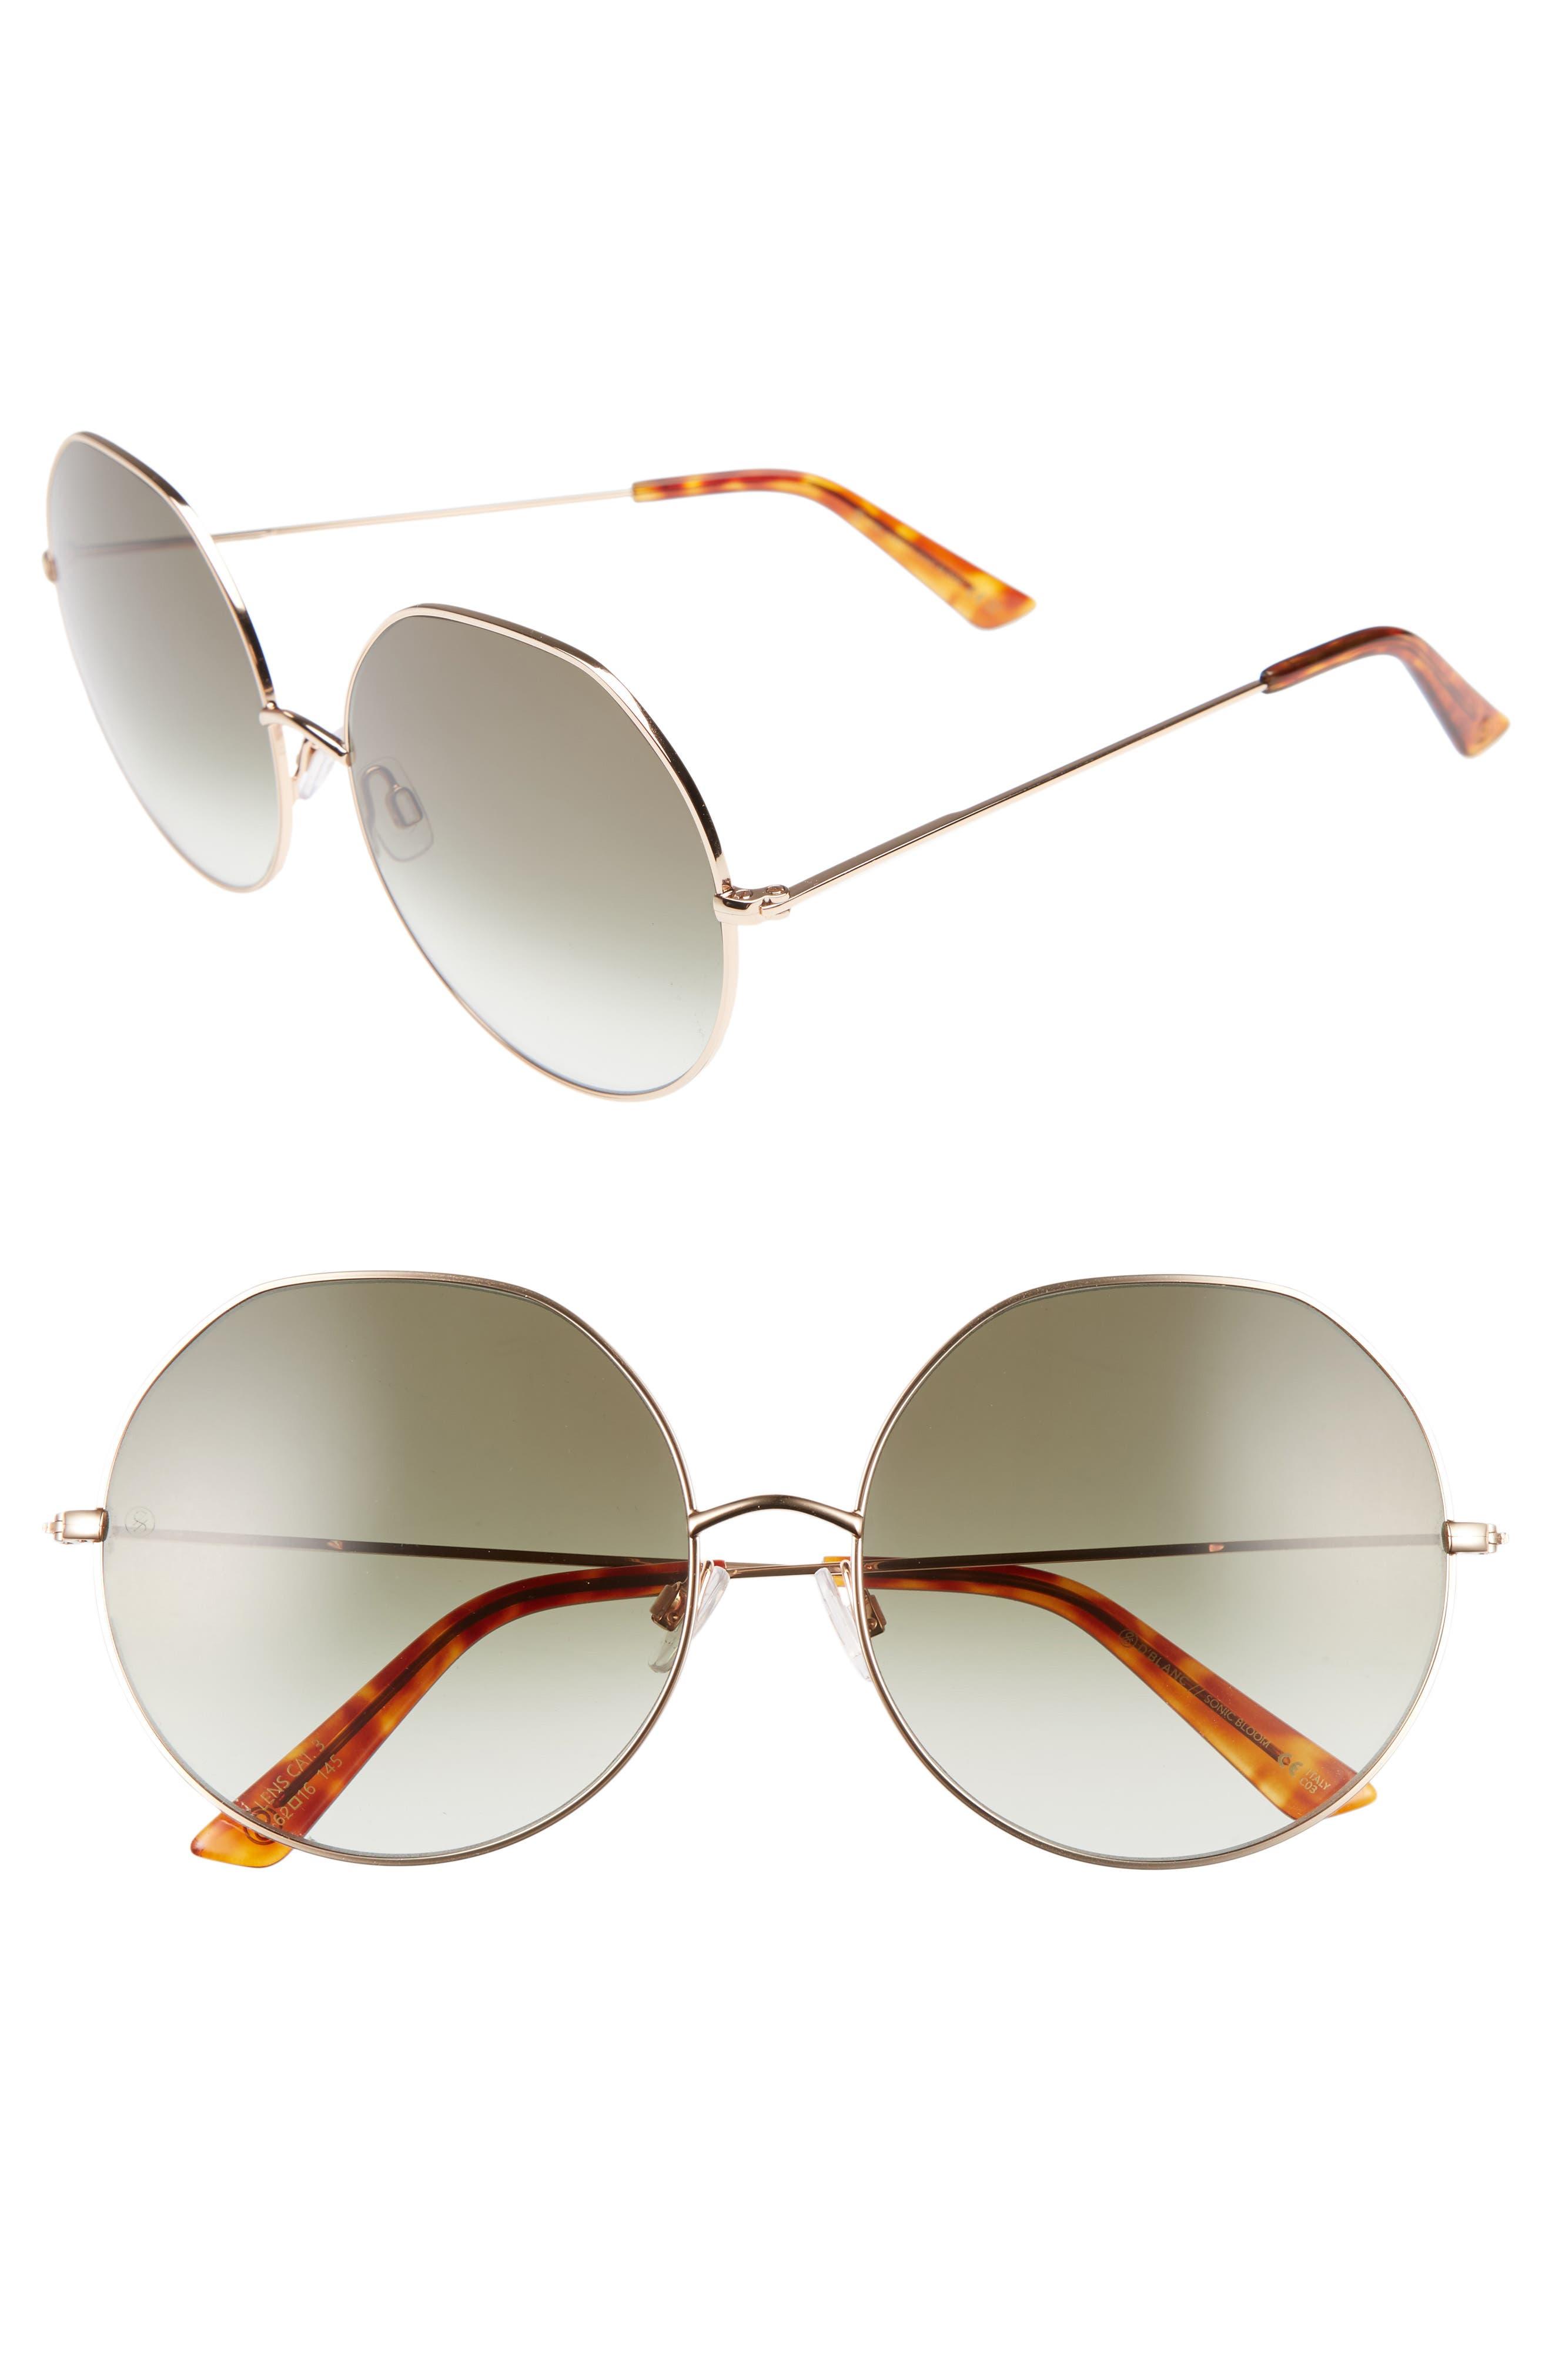 Main Image - D'BLANC Sonic Boom 62mm Gradient Round Sunglasses